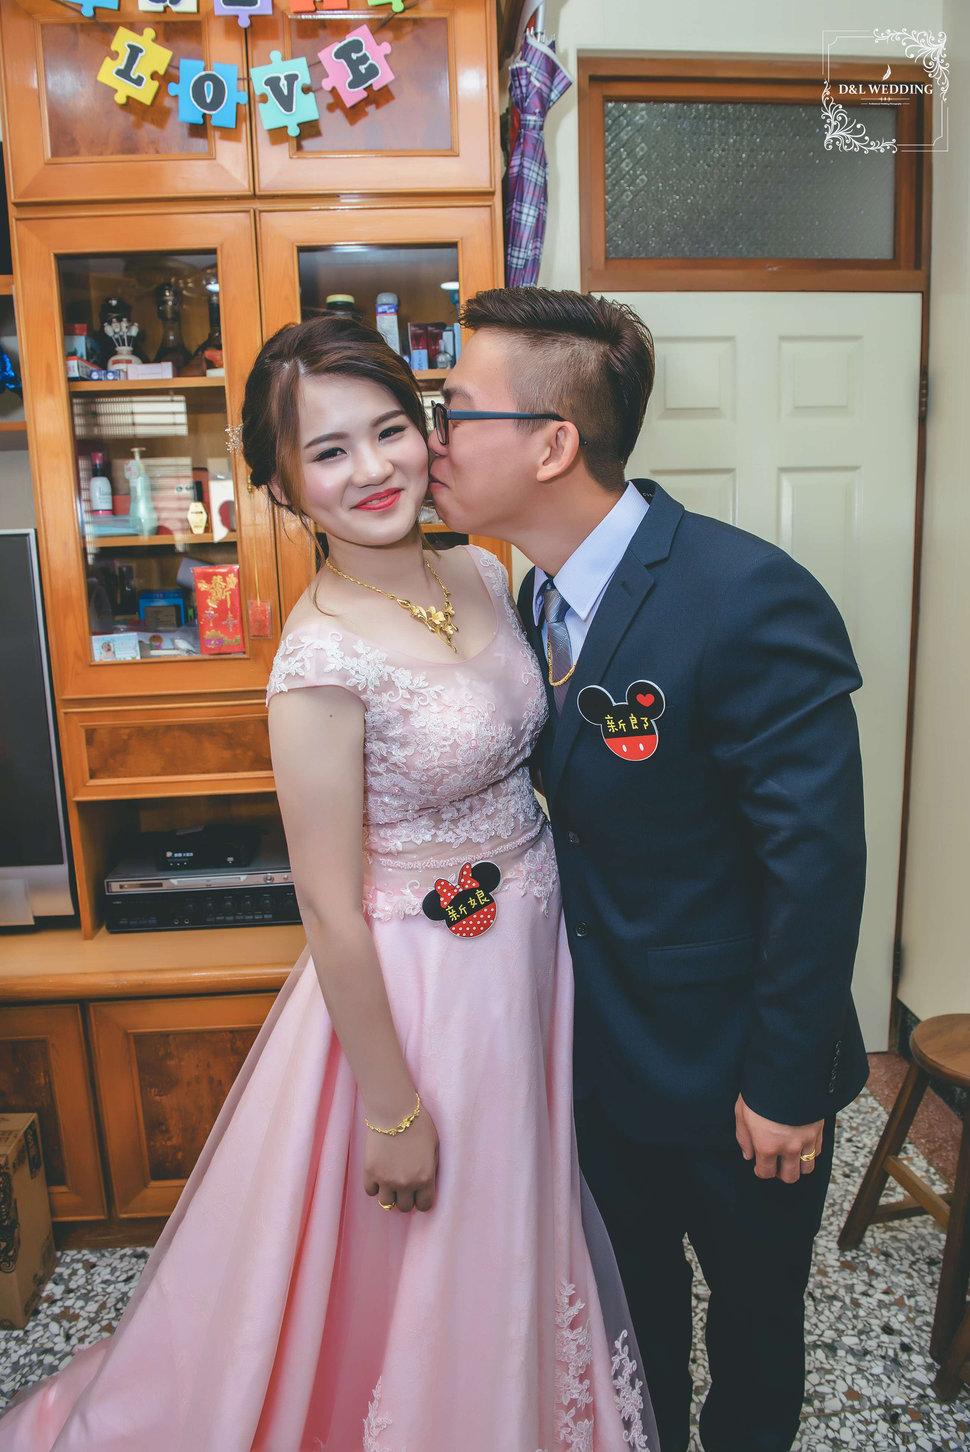 16 - D&L 婚禮事務 · 婚禮婚紗攝影 - 結婚吧